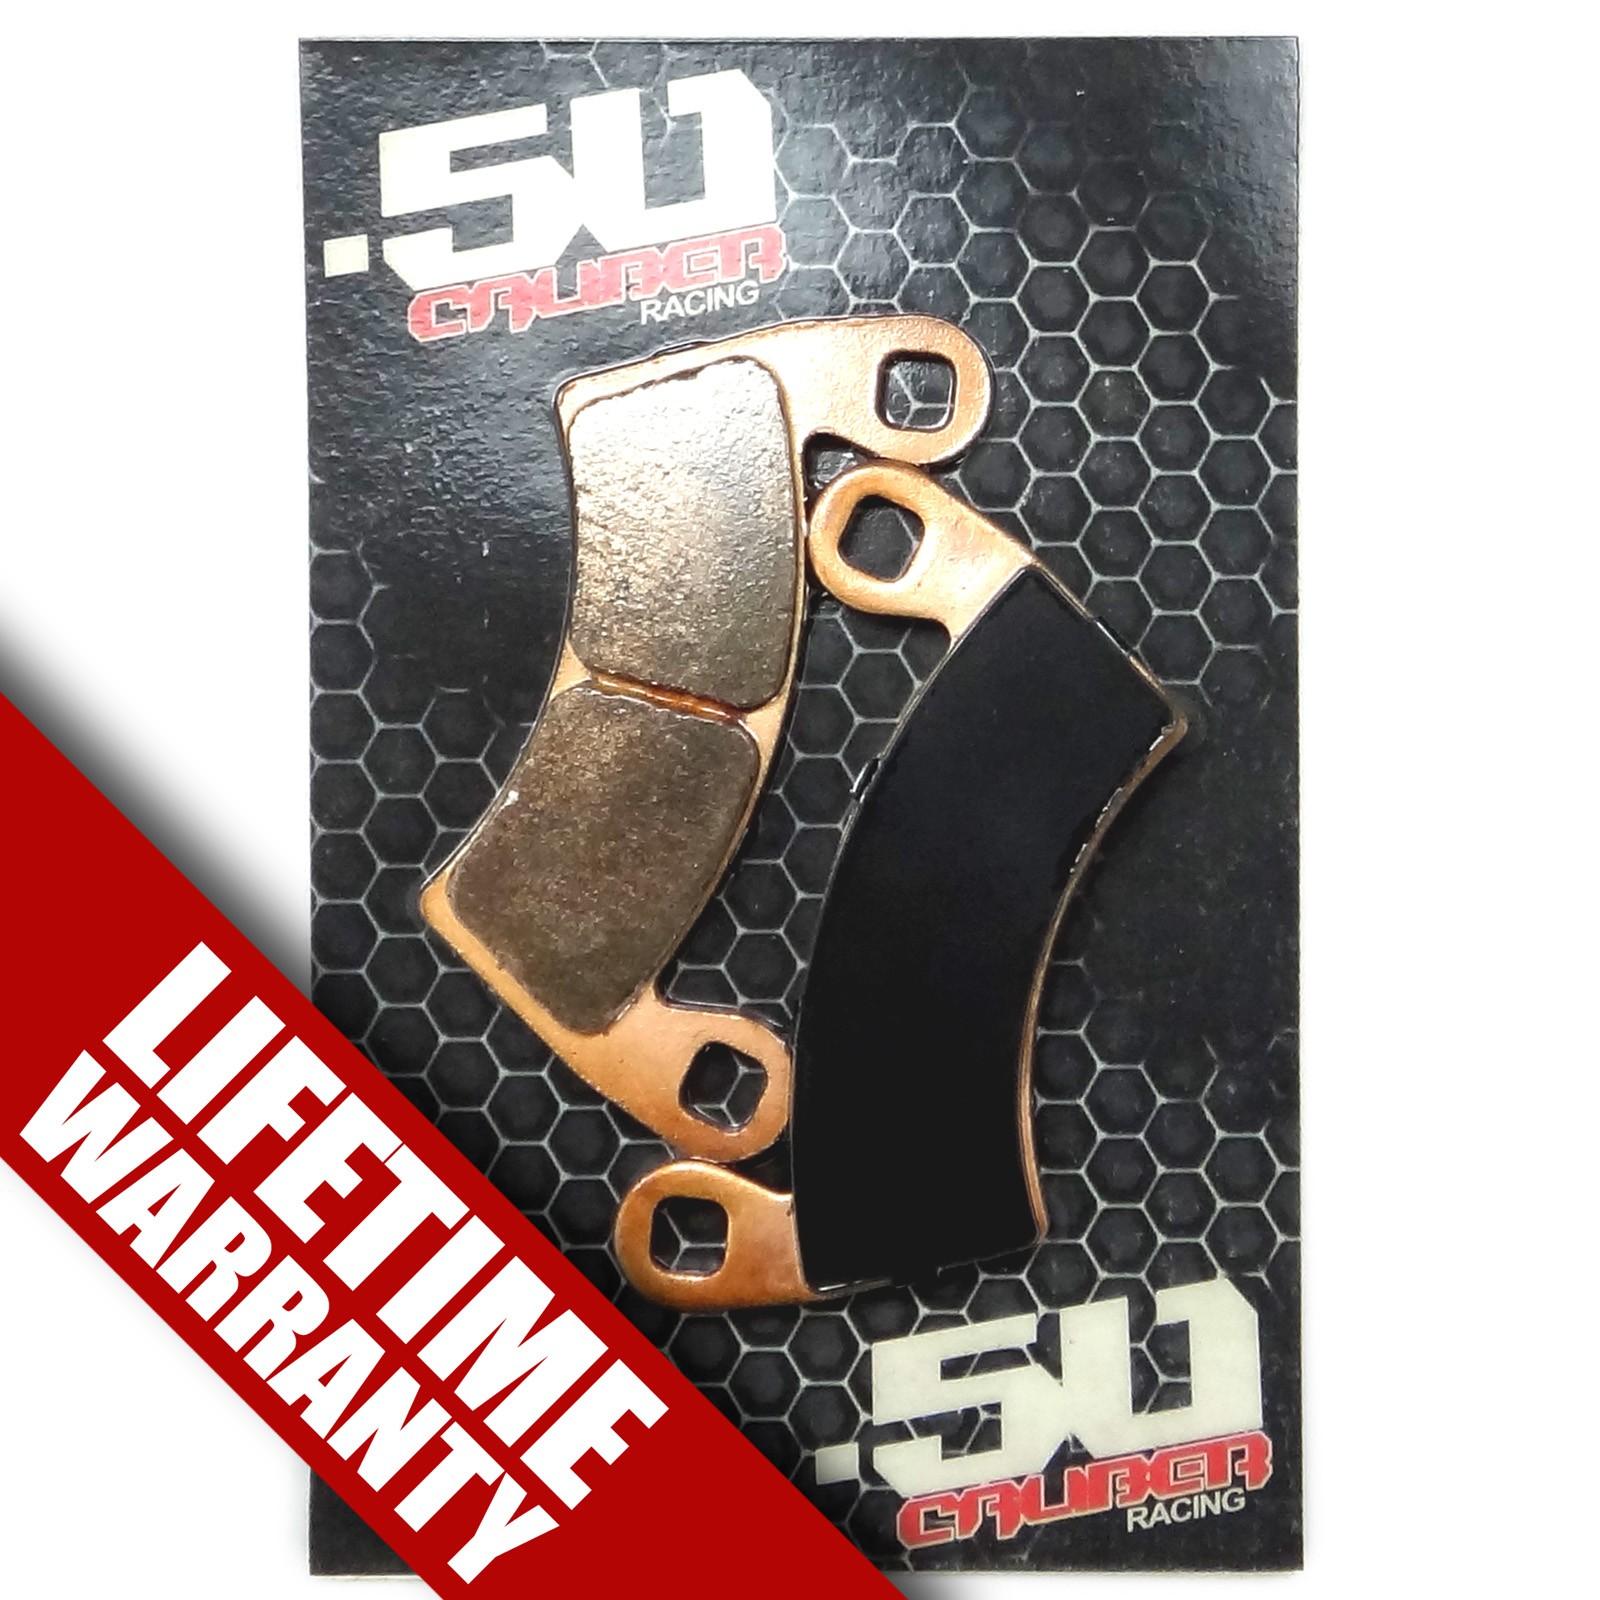 Sensational 50 Caliber Racing Rzr Disc Brake Pads Spiritservingveterans Wood Chair Design Ideas Spiritservingveteransorg